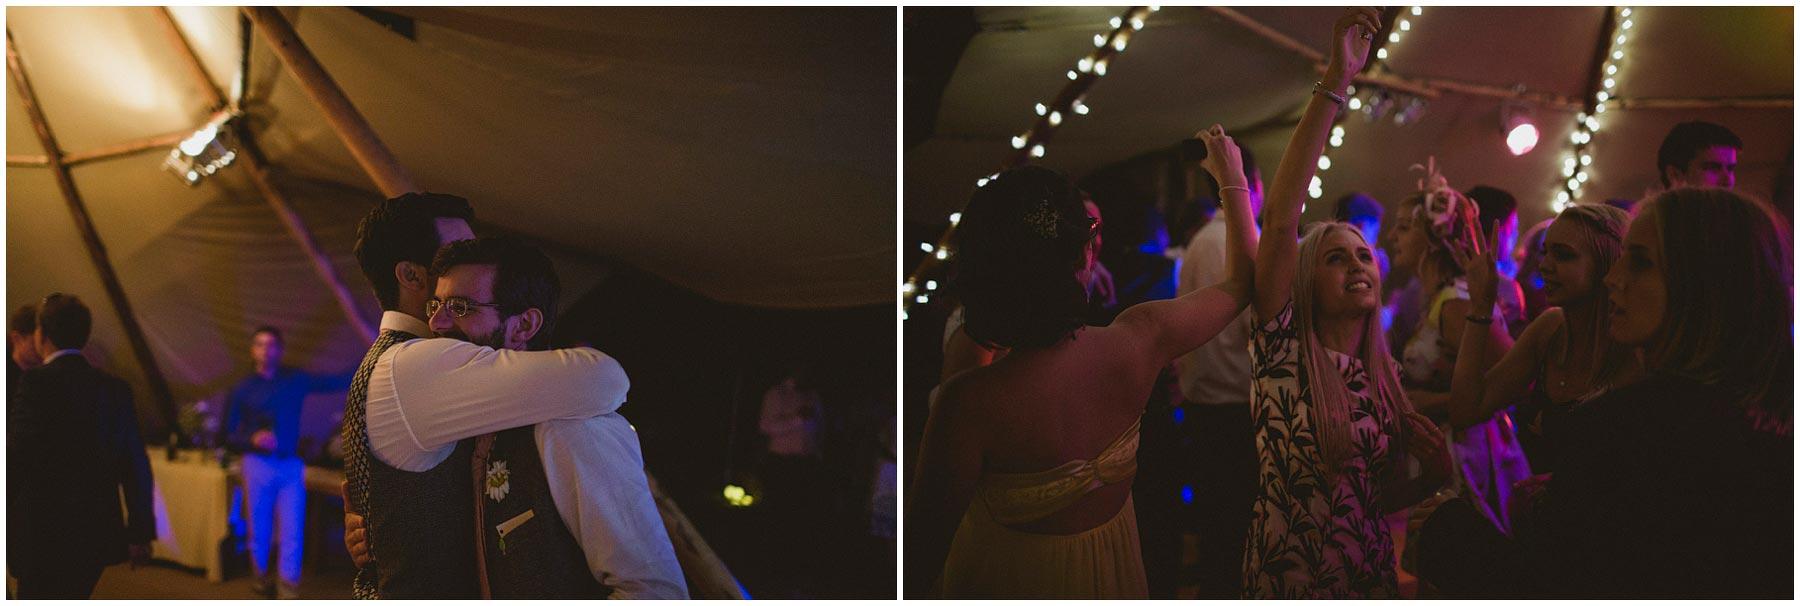 Kent-Festival-Tipi-wedding-photography_0199